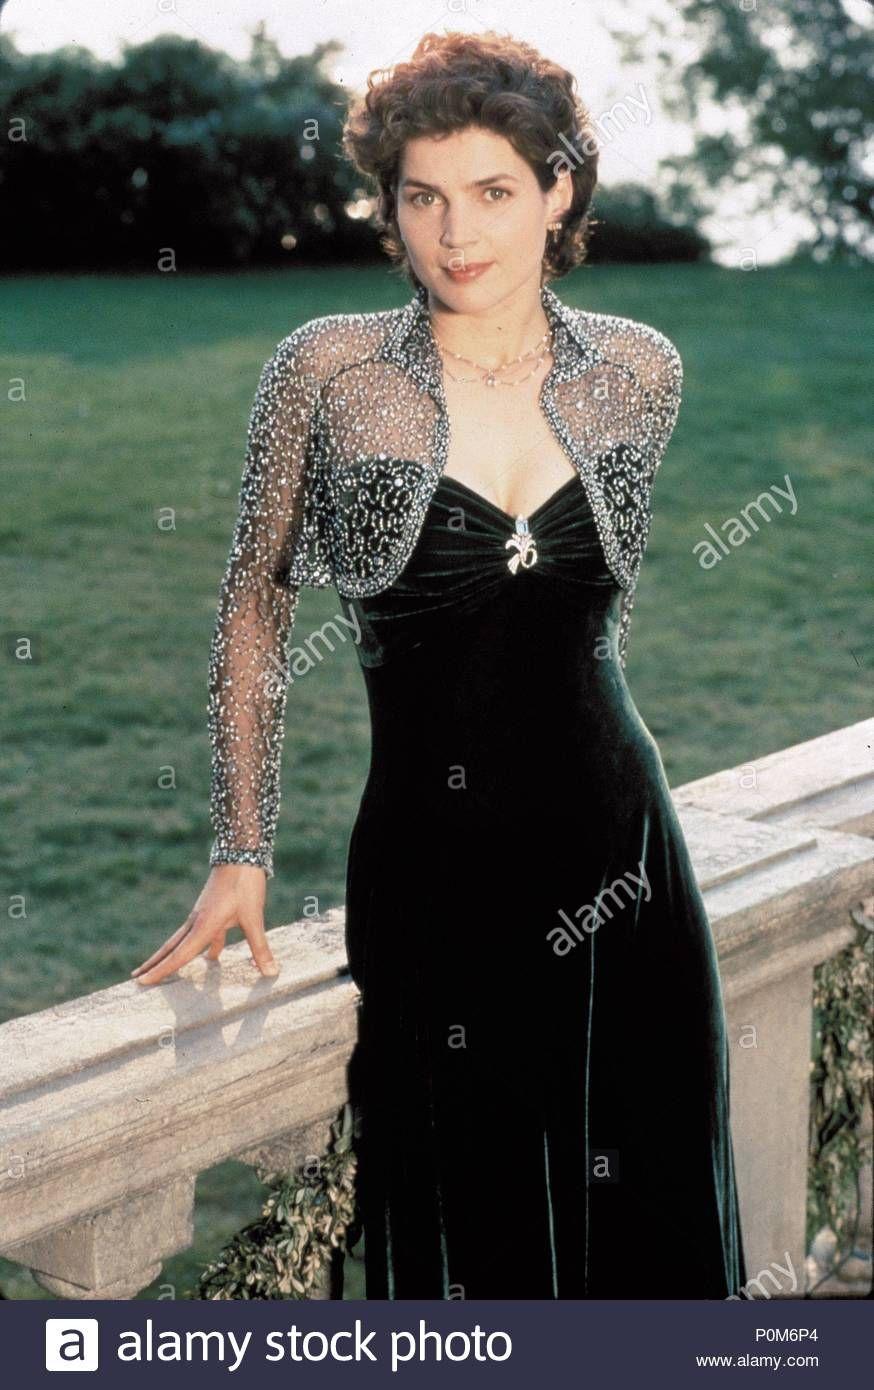 Original Film Title SABRINA. English Gowns of